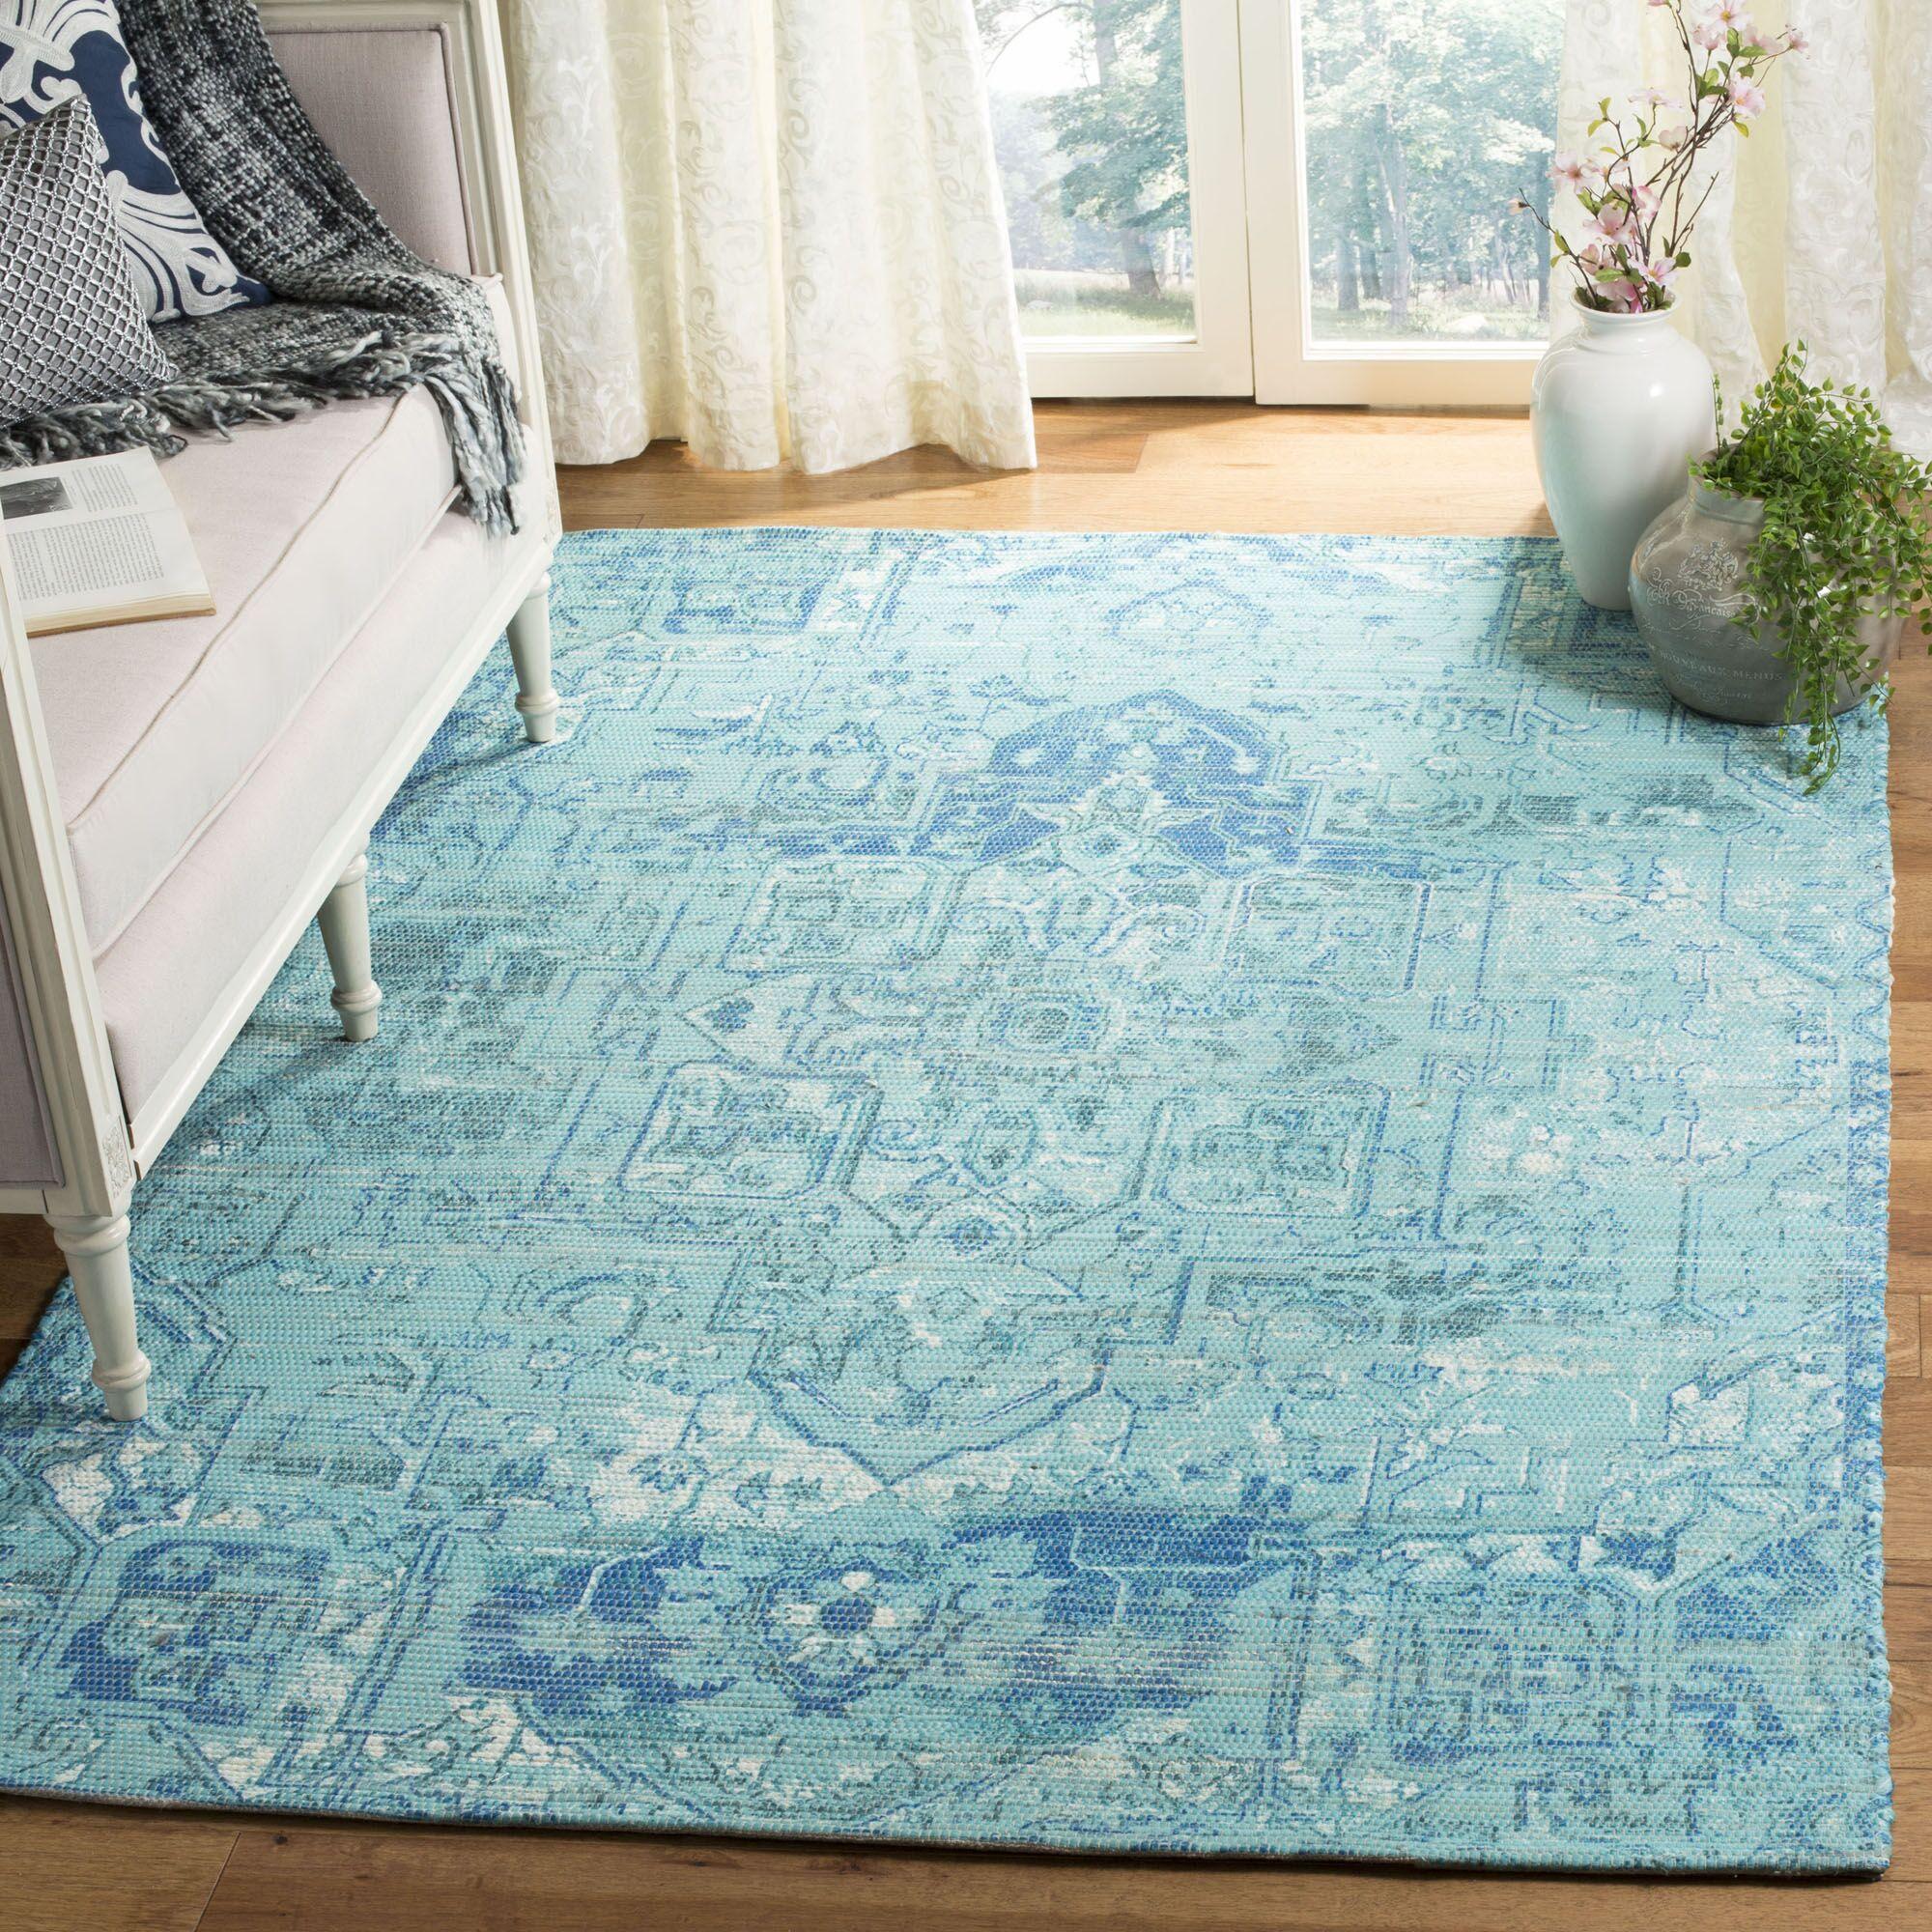 Cheng Hand Woven Aqua/Blue Area Rug Rug Size: Rectangle 8' x 10'